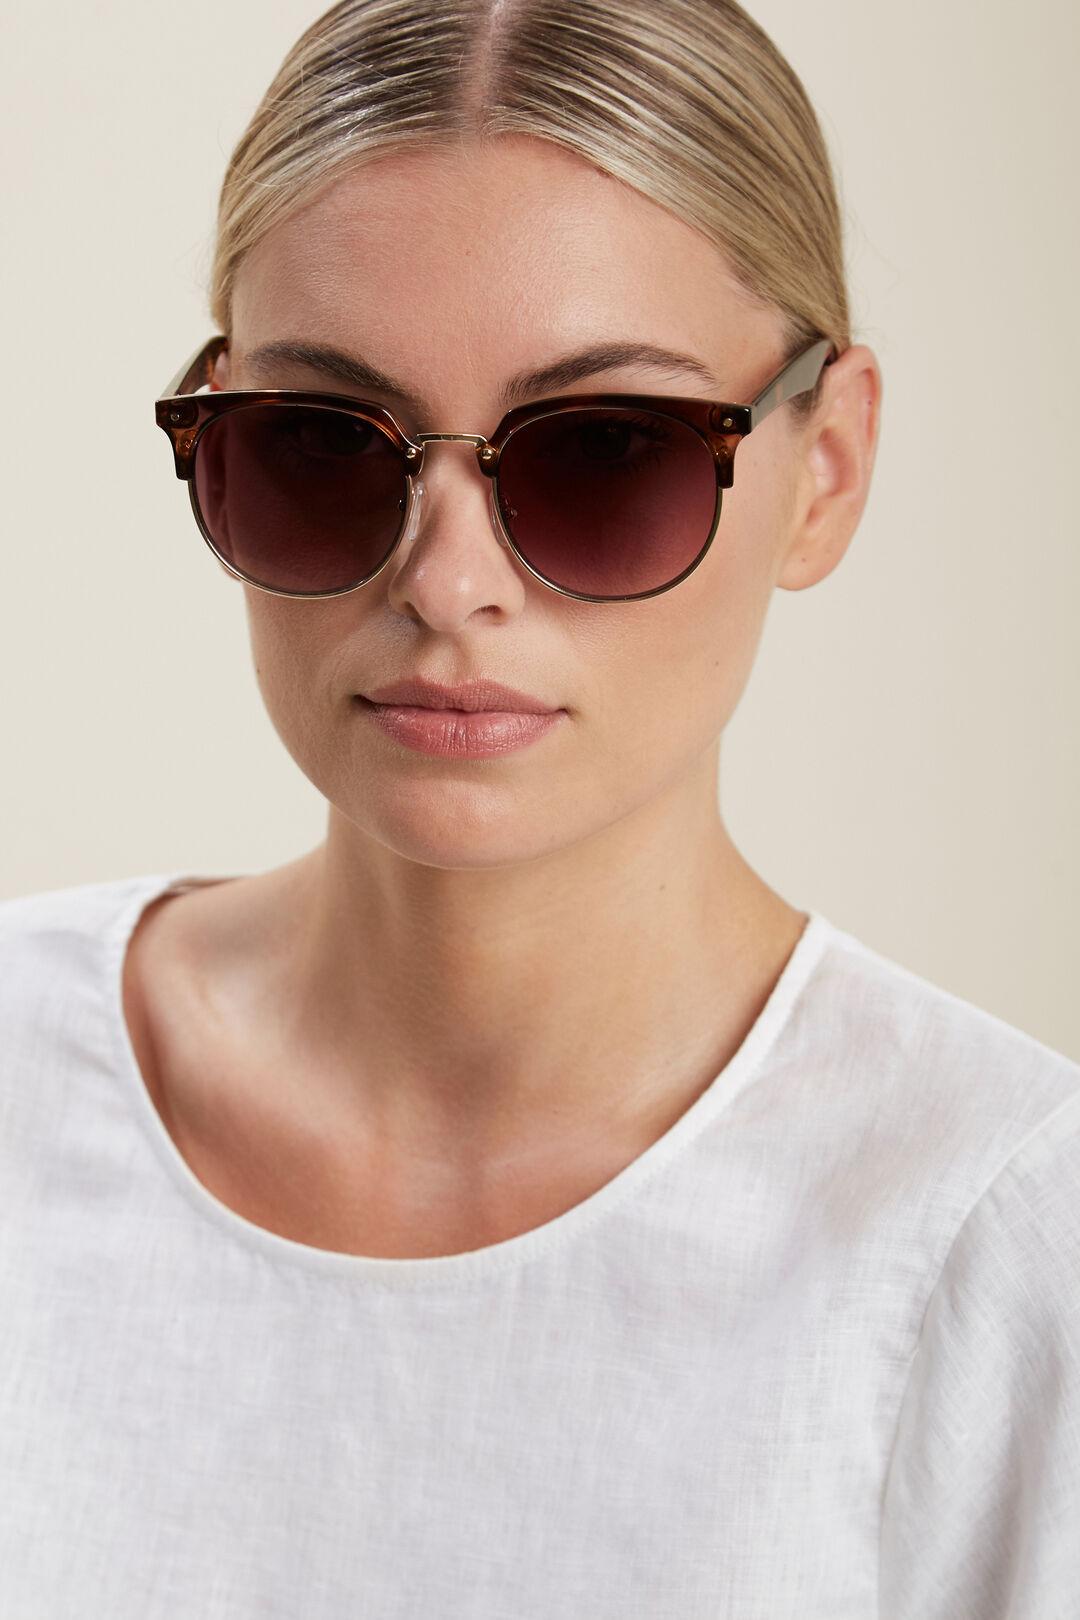 Tiarne Topbrow Sunglasses  TORT  hi-res